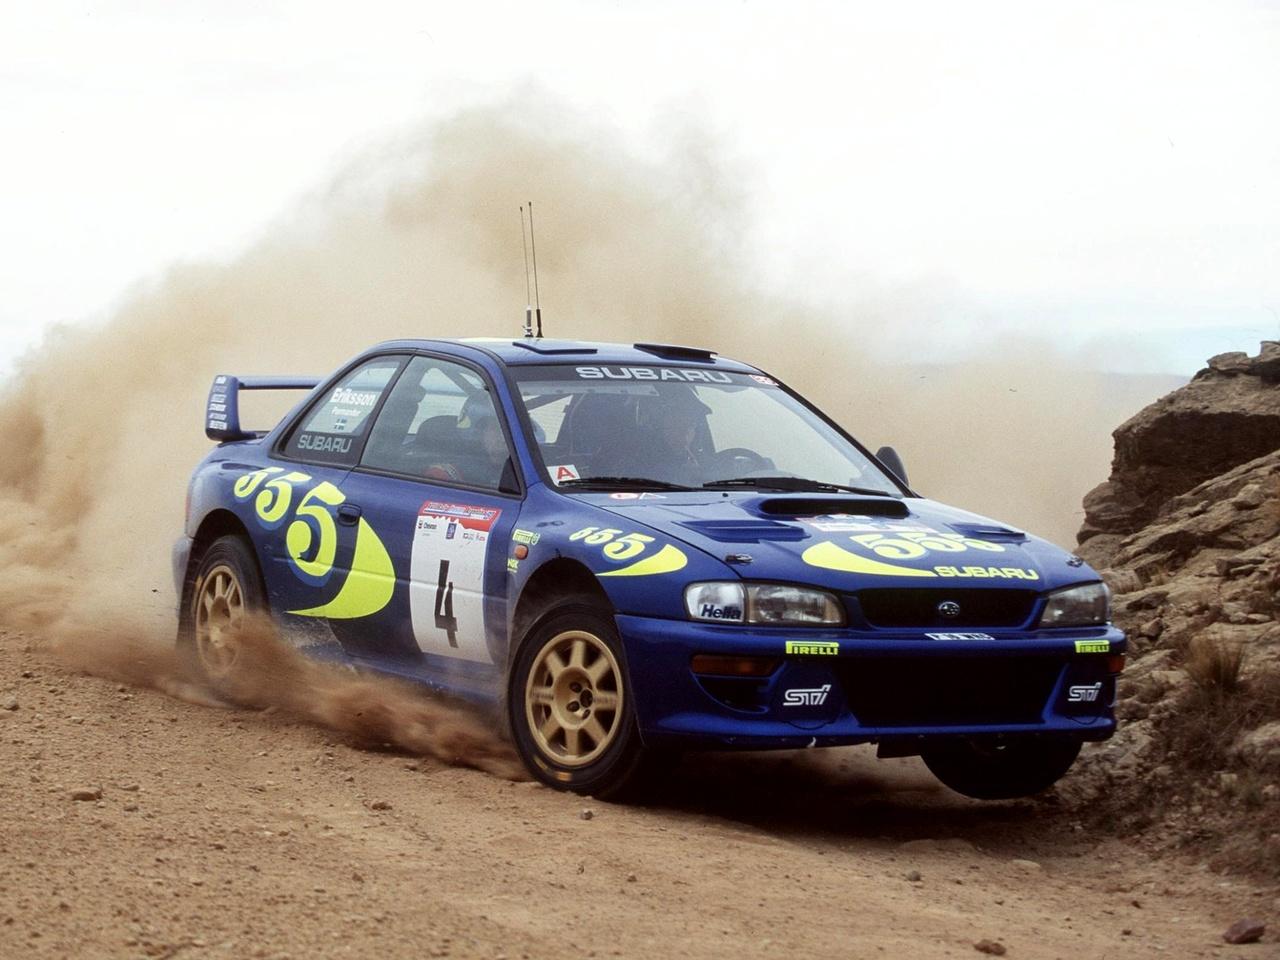 Subaru Impreza Wrc Photos Photogallery With 38 Pics